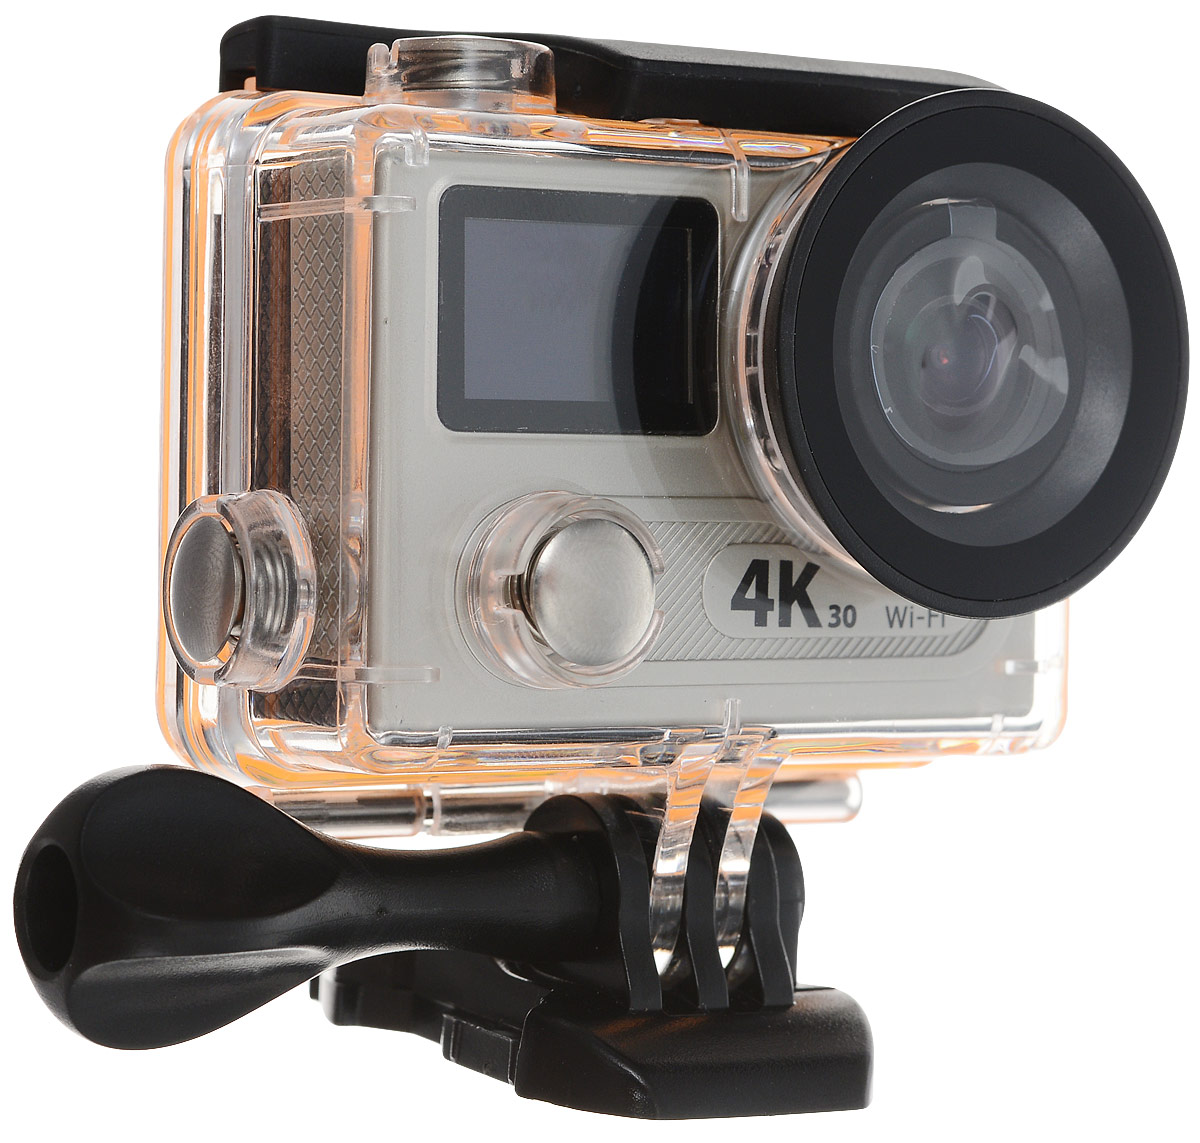 Eken H8R Ultra HD, Grey экшн-камера экшн камера ivue dvr 10 pro hd с пультом ду